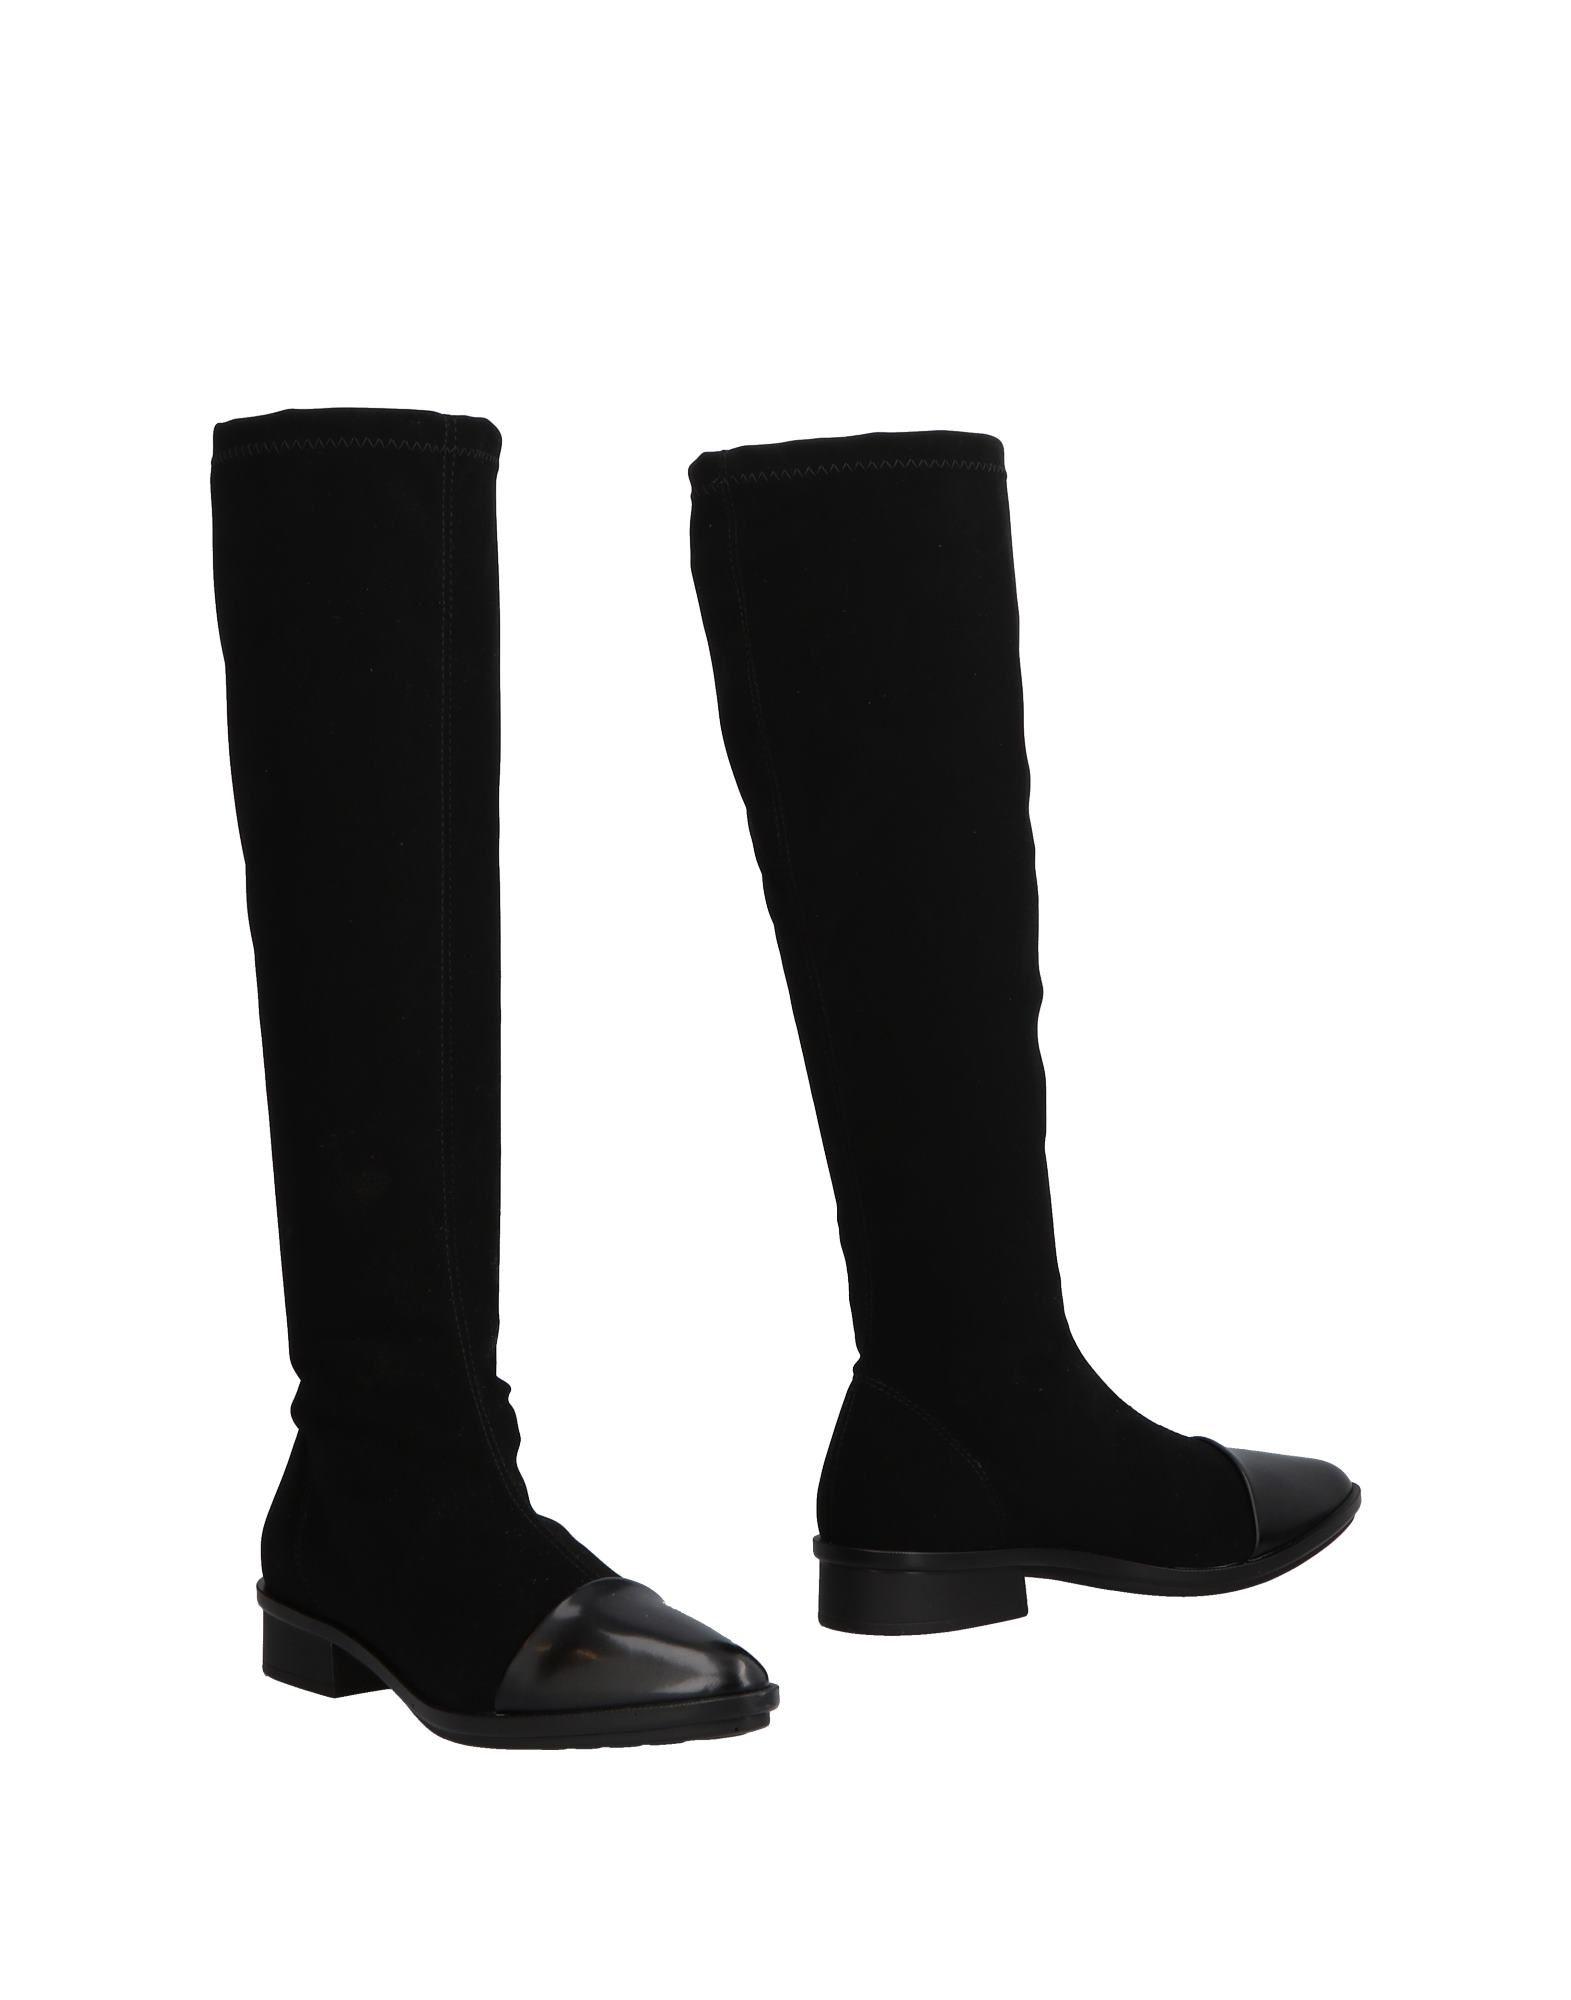 Nr Rapisardi Rapisardi Boots - Women Nr Rapisardi Rapisardi Boots online on  United Kingdom - 11504911SN 7a7c21